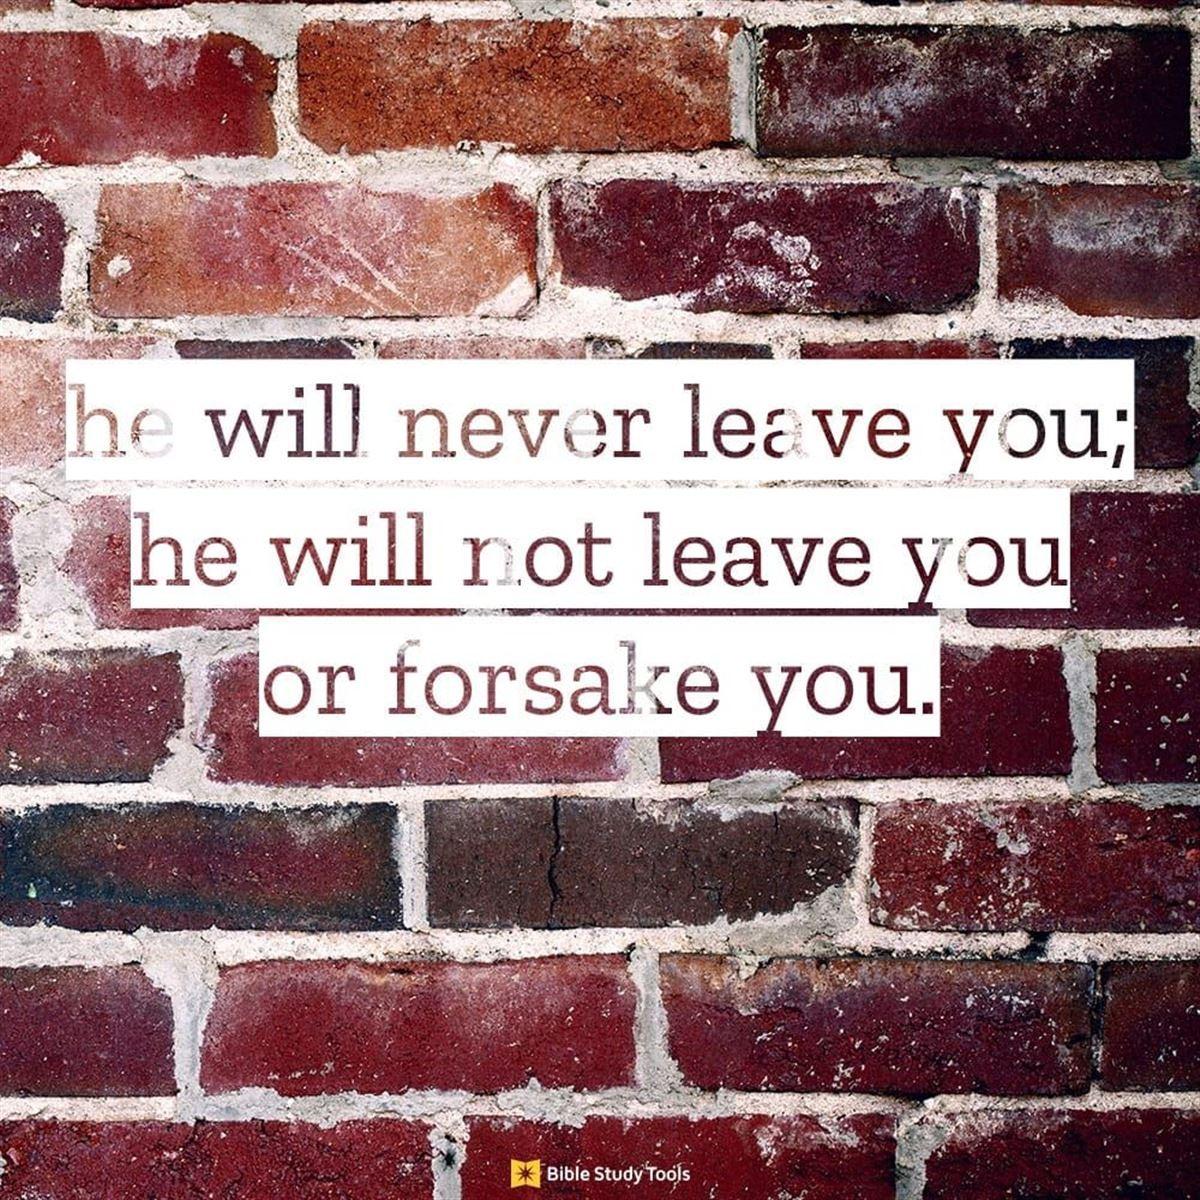 Your Daily Verse - Deuteronomy 31:8